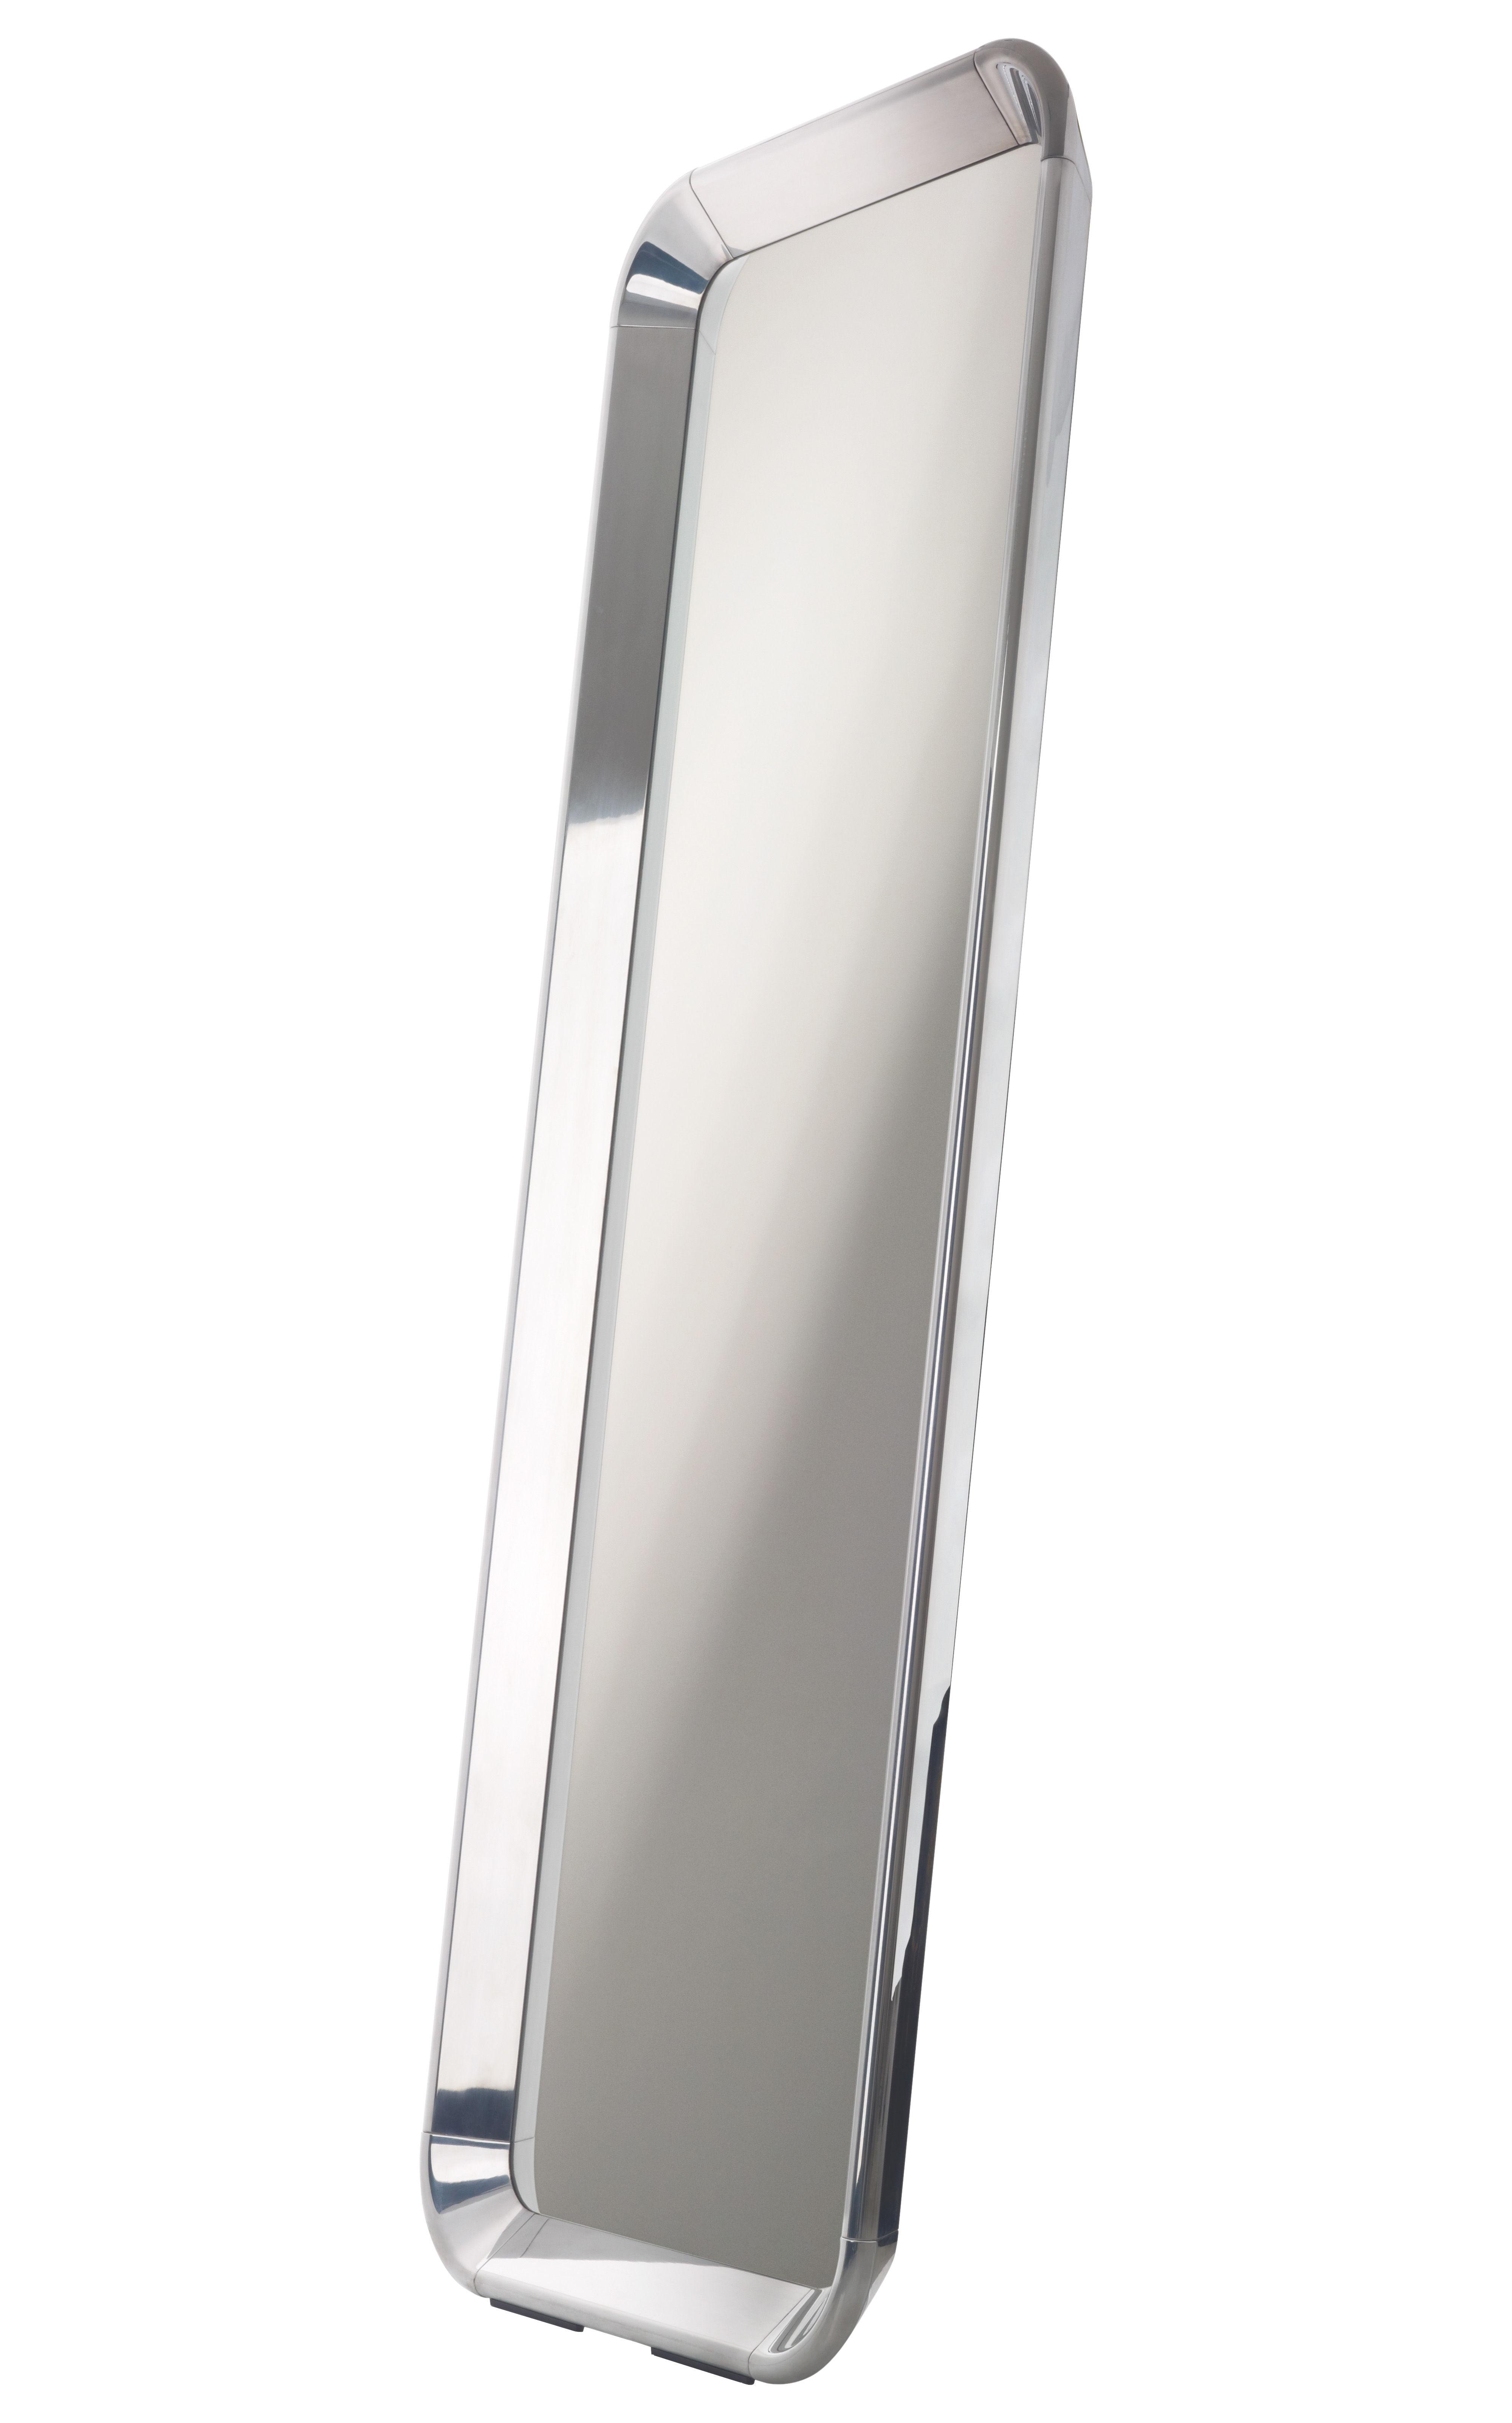 d j vu 190 x 73 cm magis spiegel. Black Bedroom Furniture Sets. Home Design Ideas